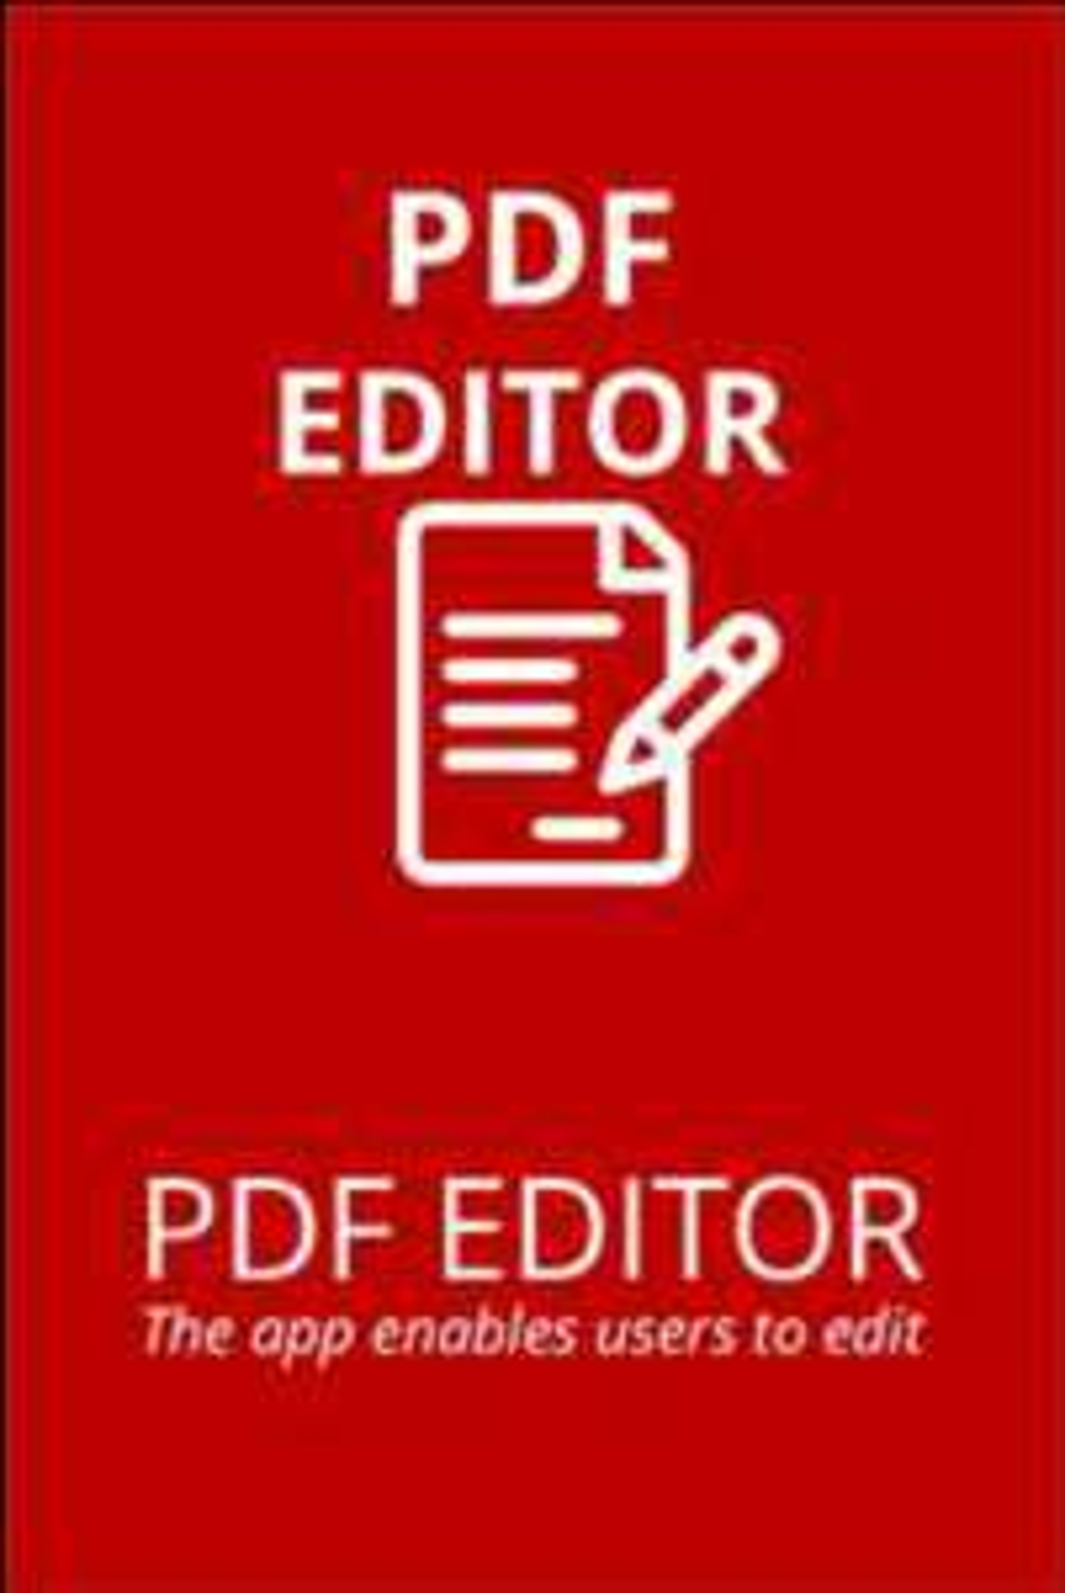 Editor For Adobe Acrobat PDF Reader Annotate : PDF Editor ,Merge PDF , Sign & Fill PDF (Windows)